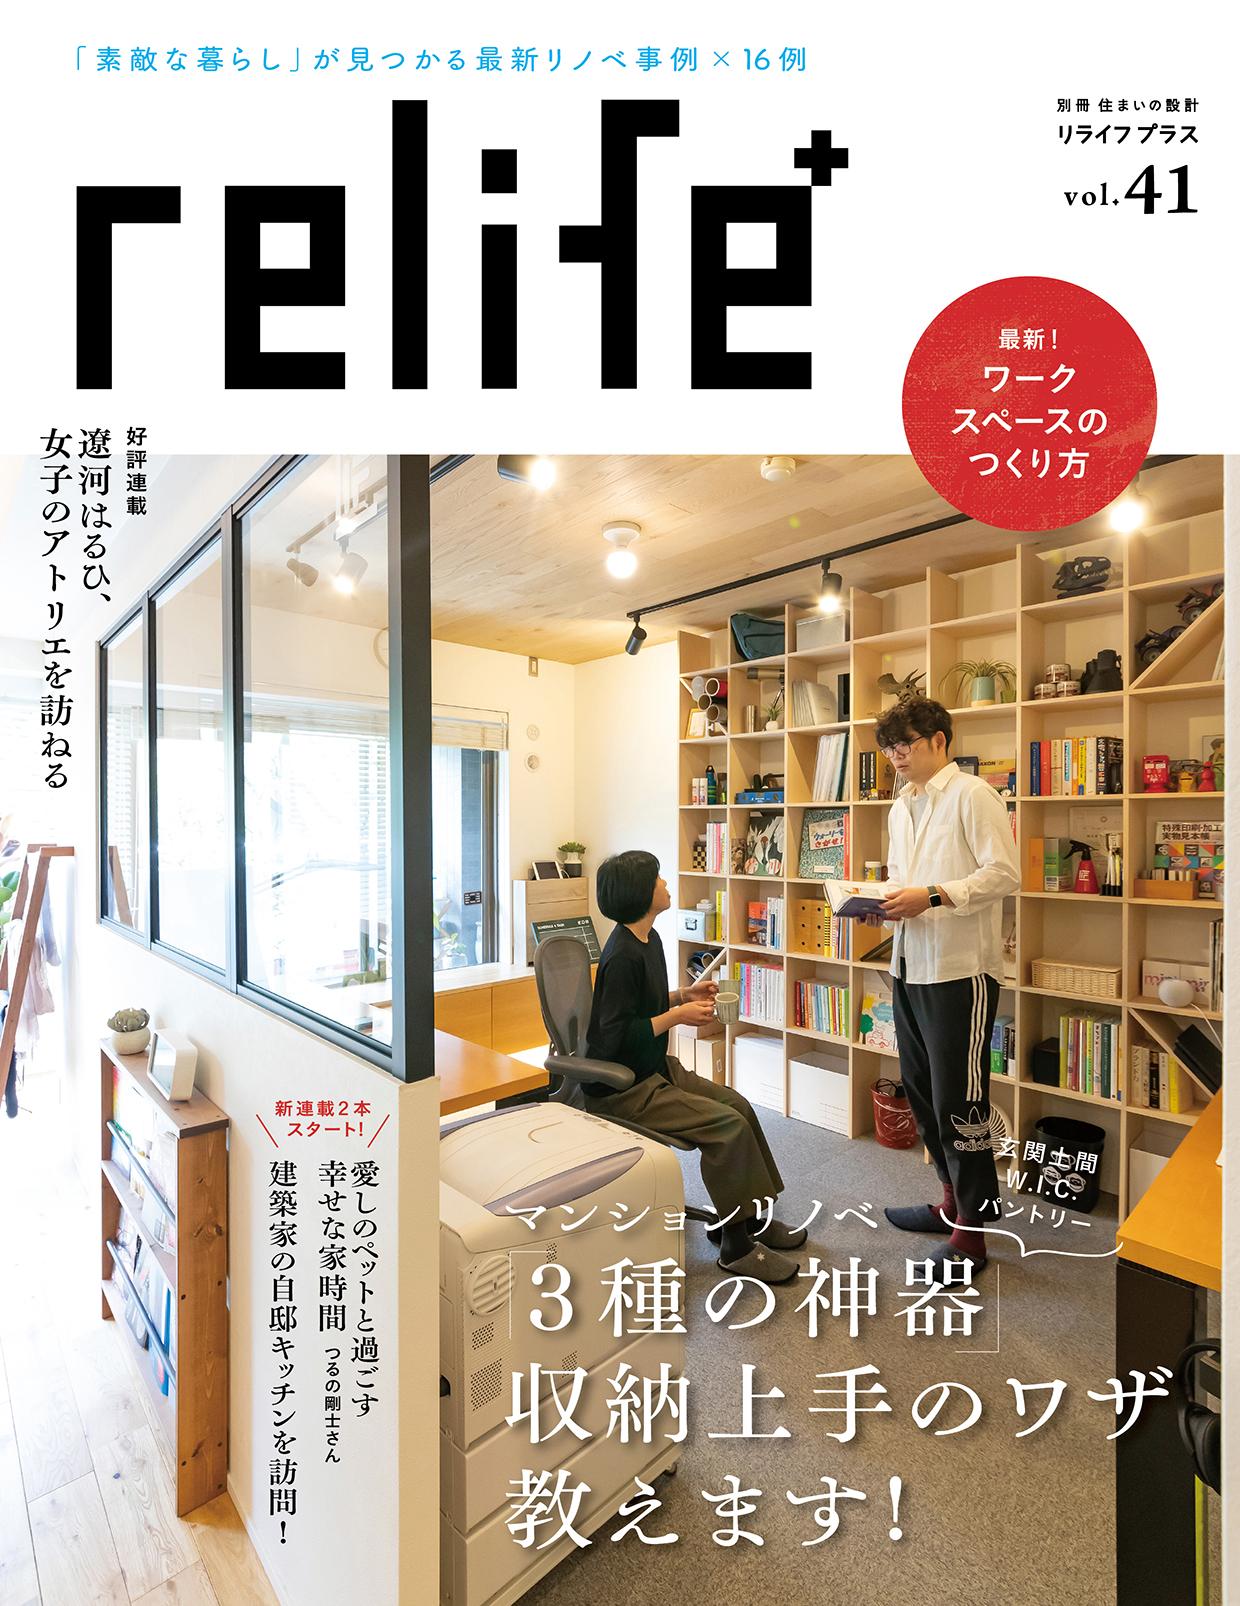 記事掲載:雑誌「relife+ vol.41」